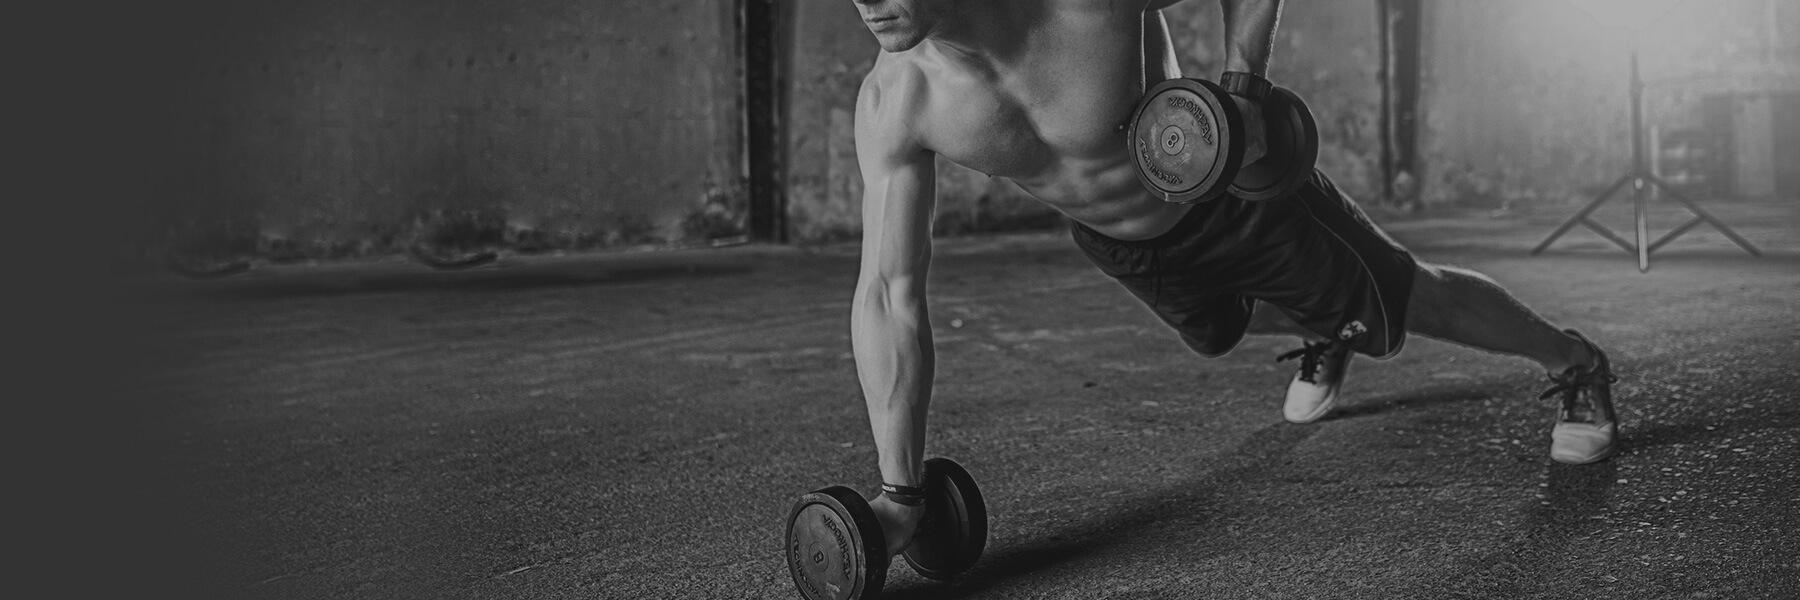 strong-man-lifting-barbells-fitness